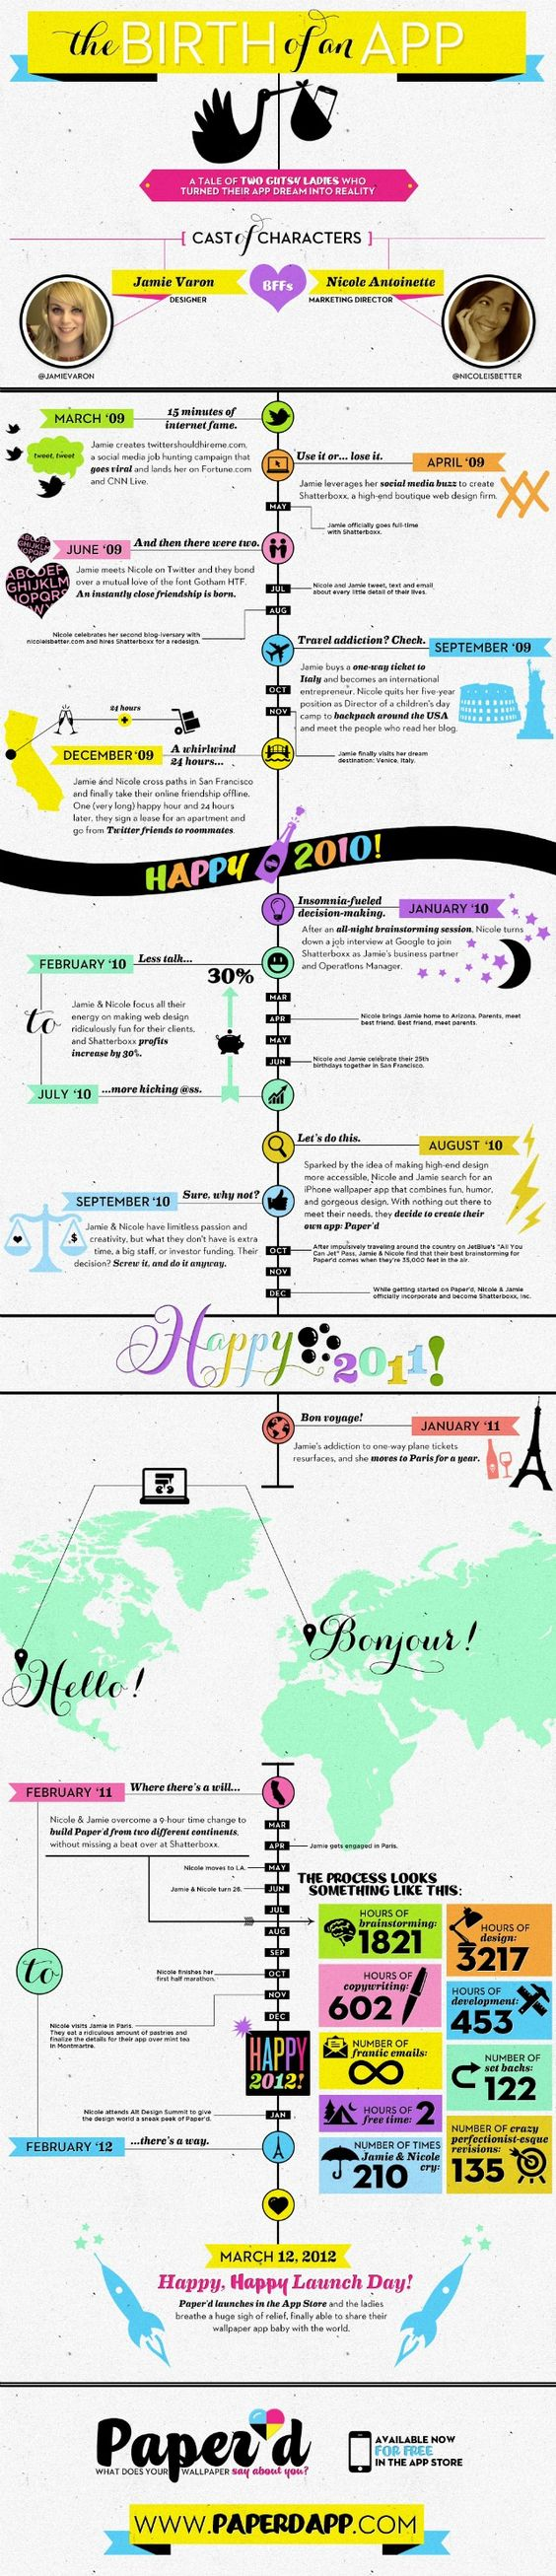 The Journey of Paperdapp